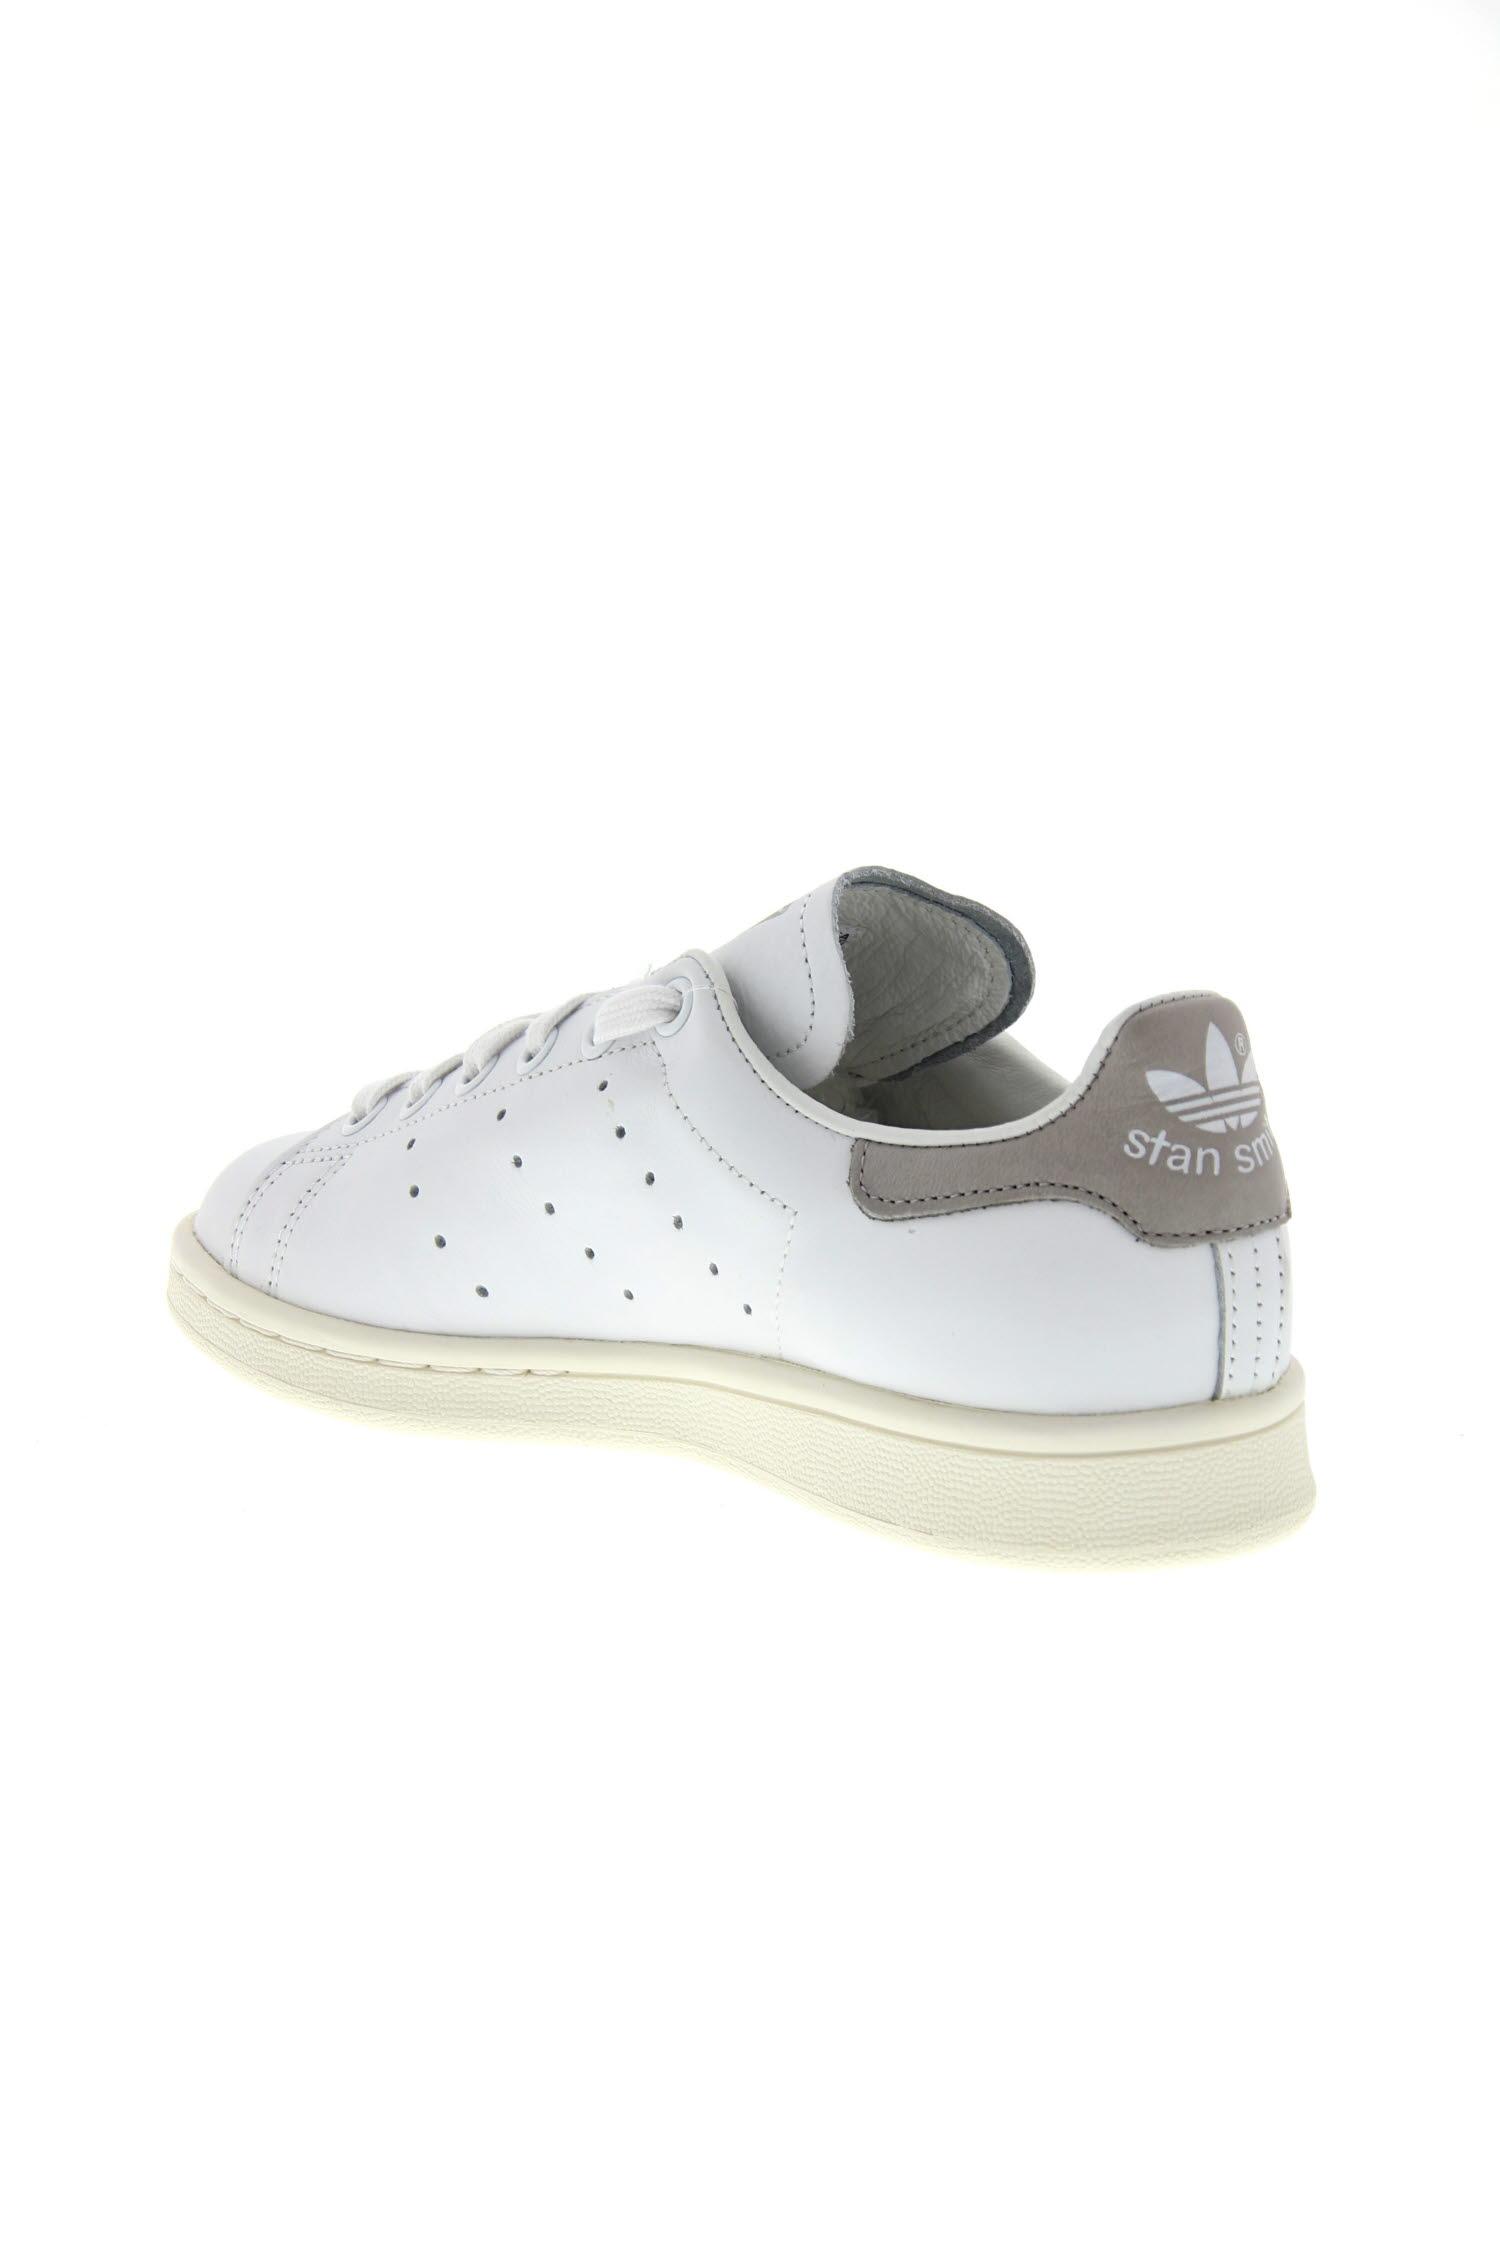 accueil chaussures baskets stan smith og blanche et bleu. Black Bedroom Furniture Sets. Home Design Ideas